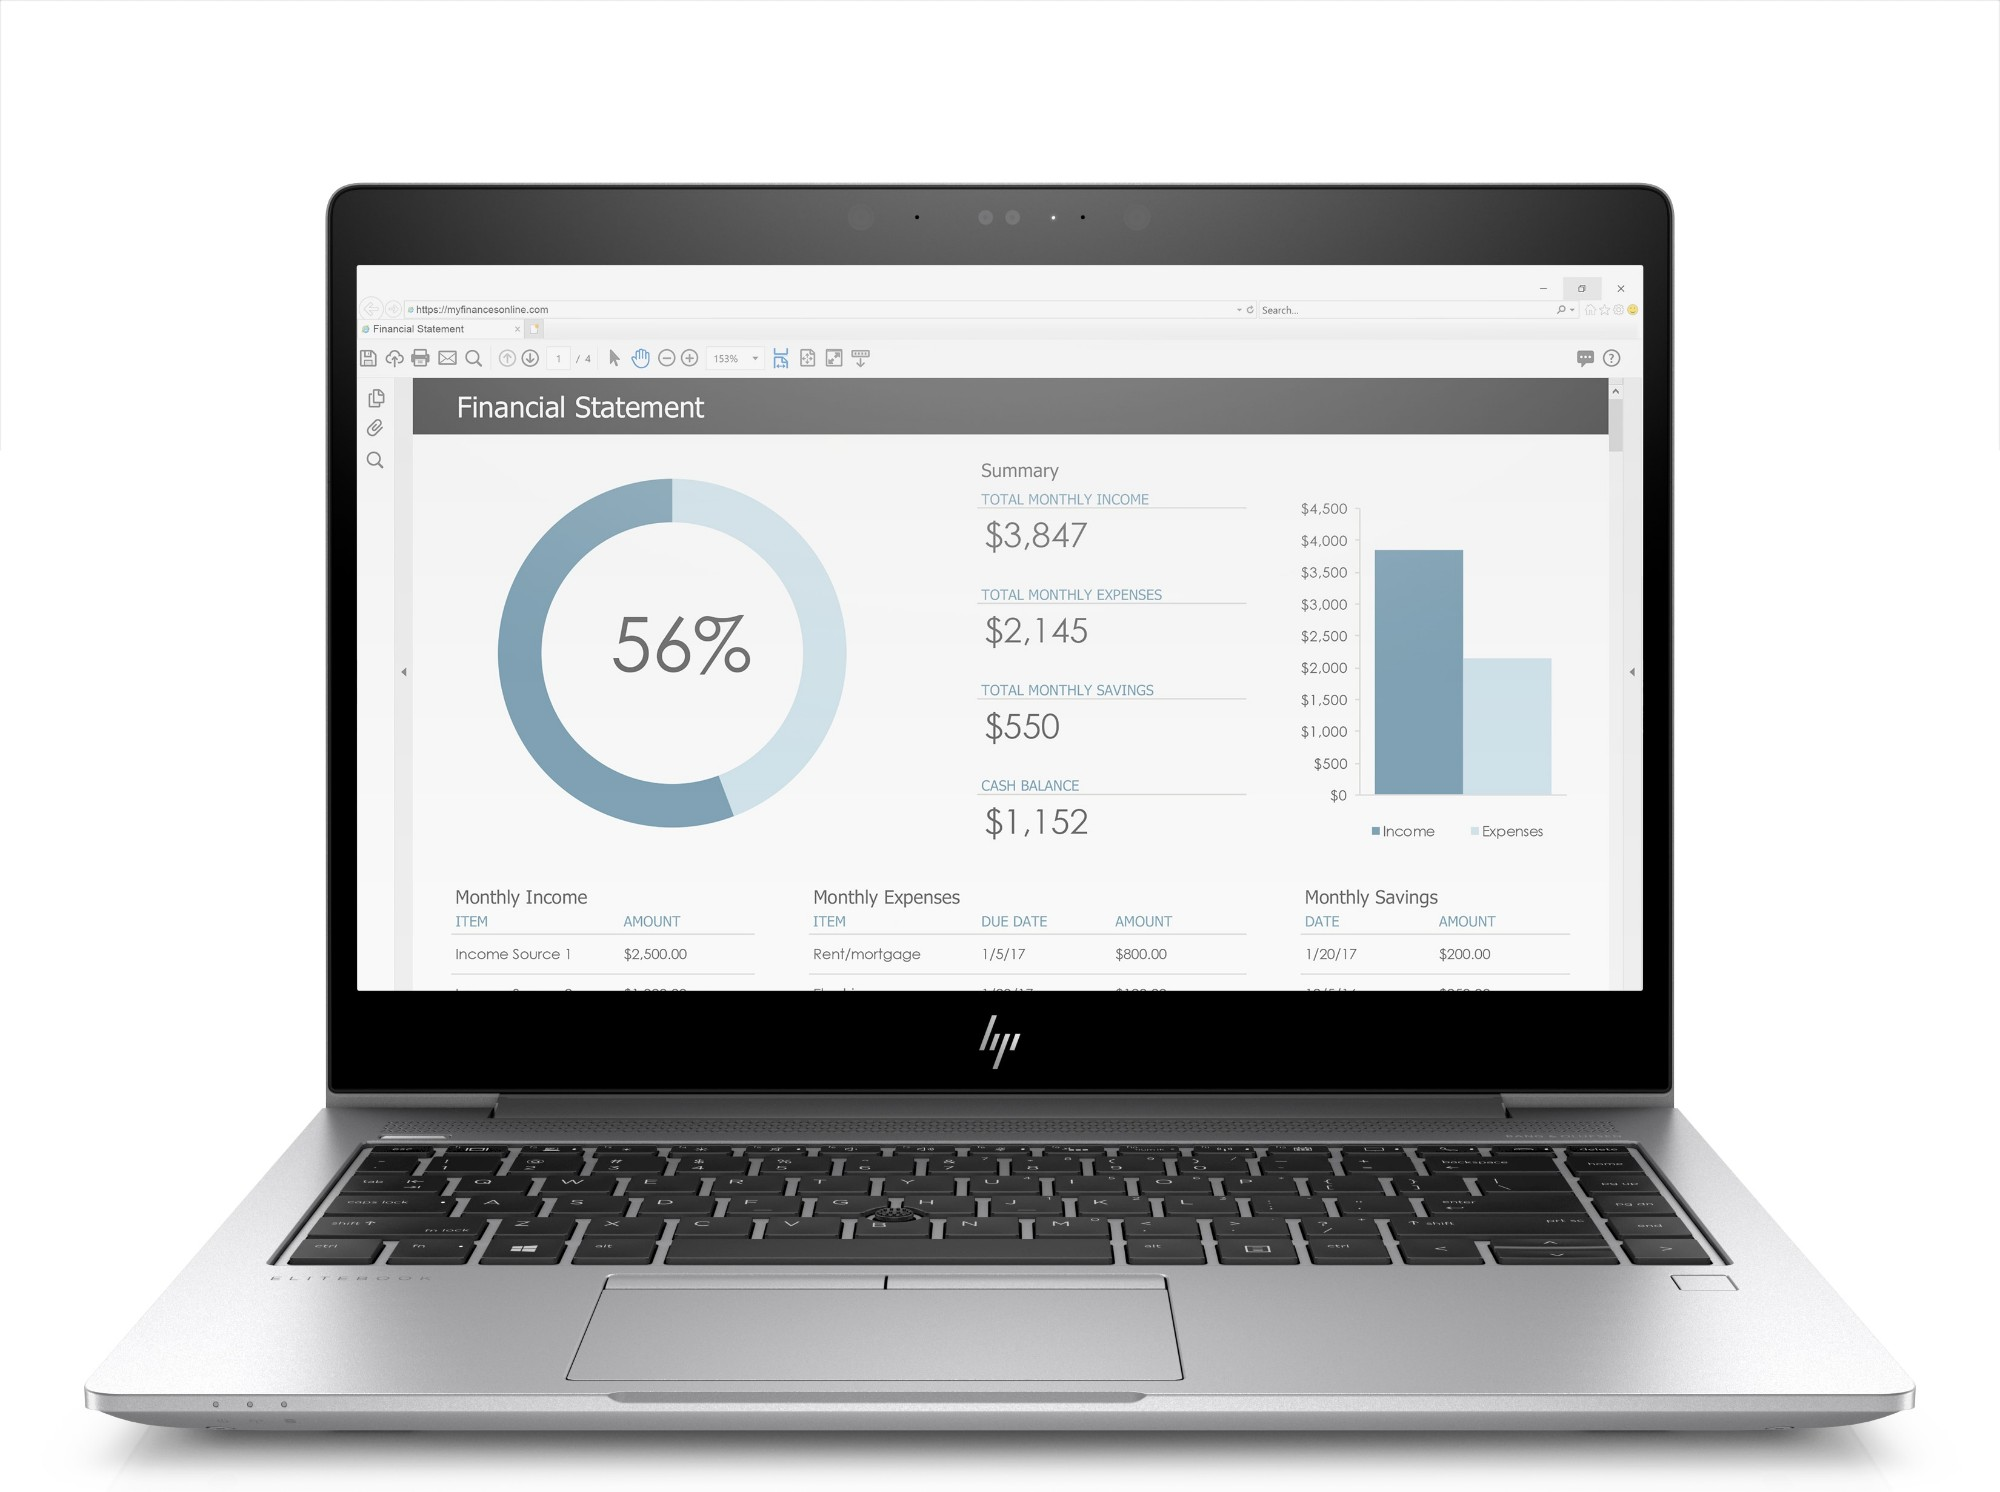 HP EliteBook 840 G3 2.5GHz i7-6500U 6th gen Intel® Core™ i7 14